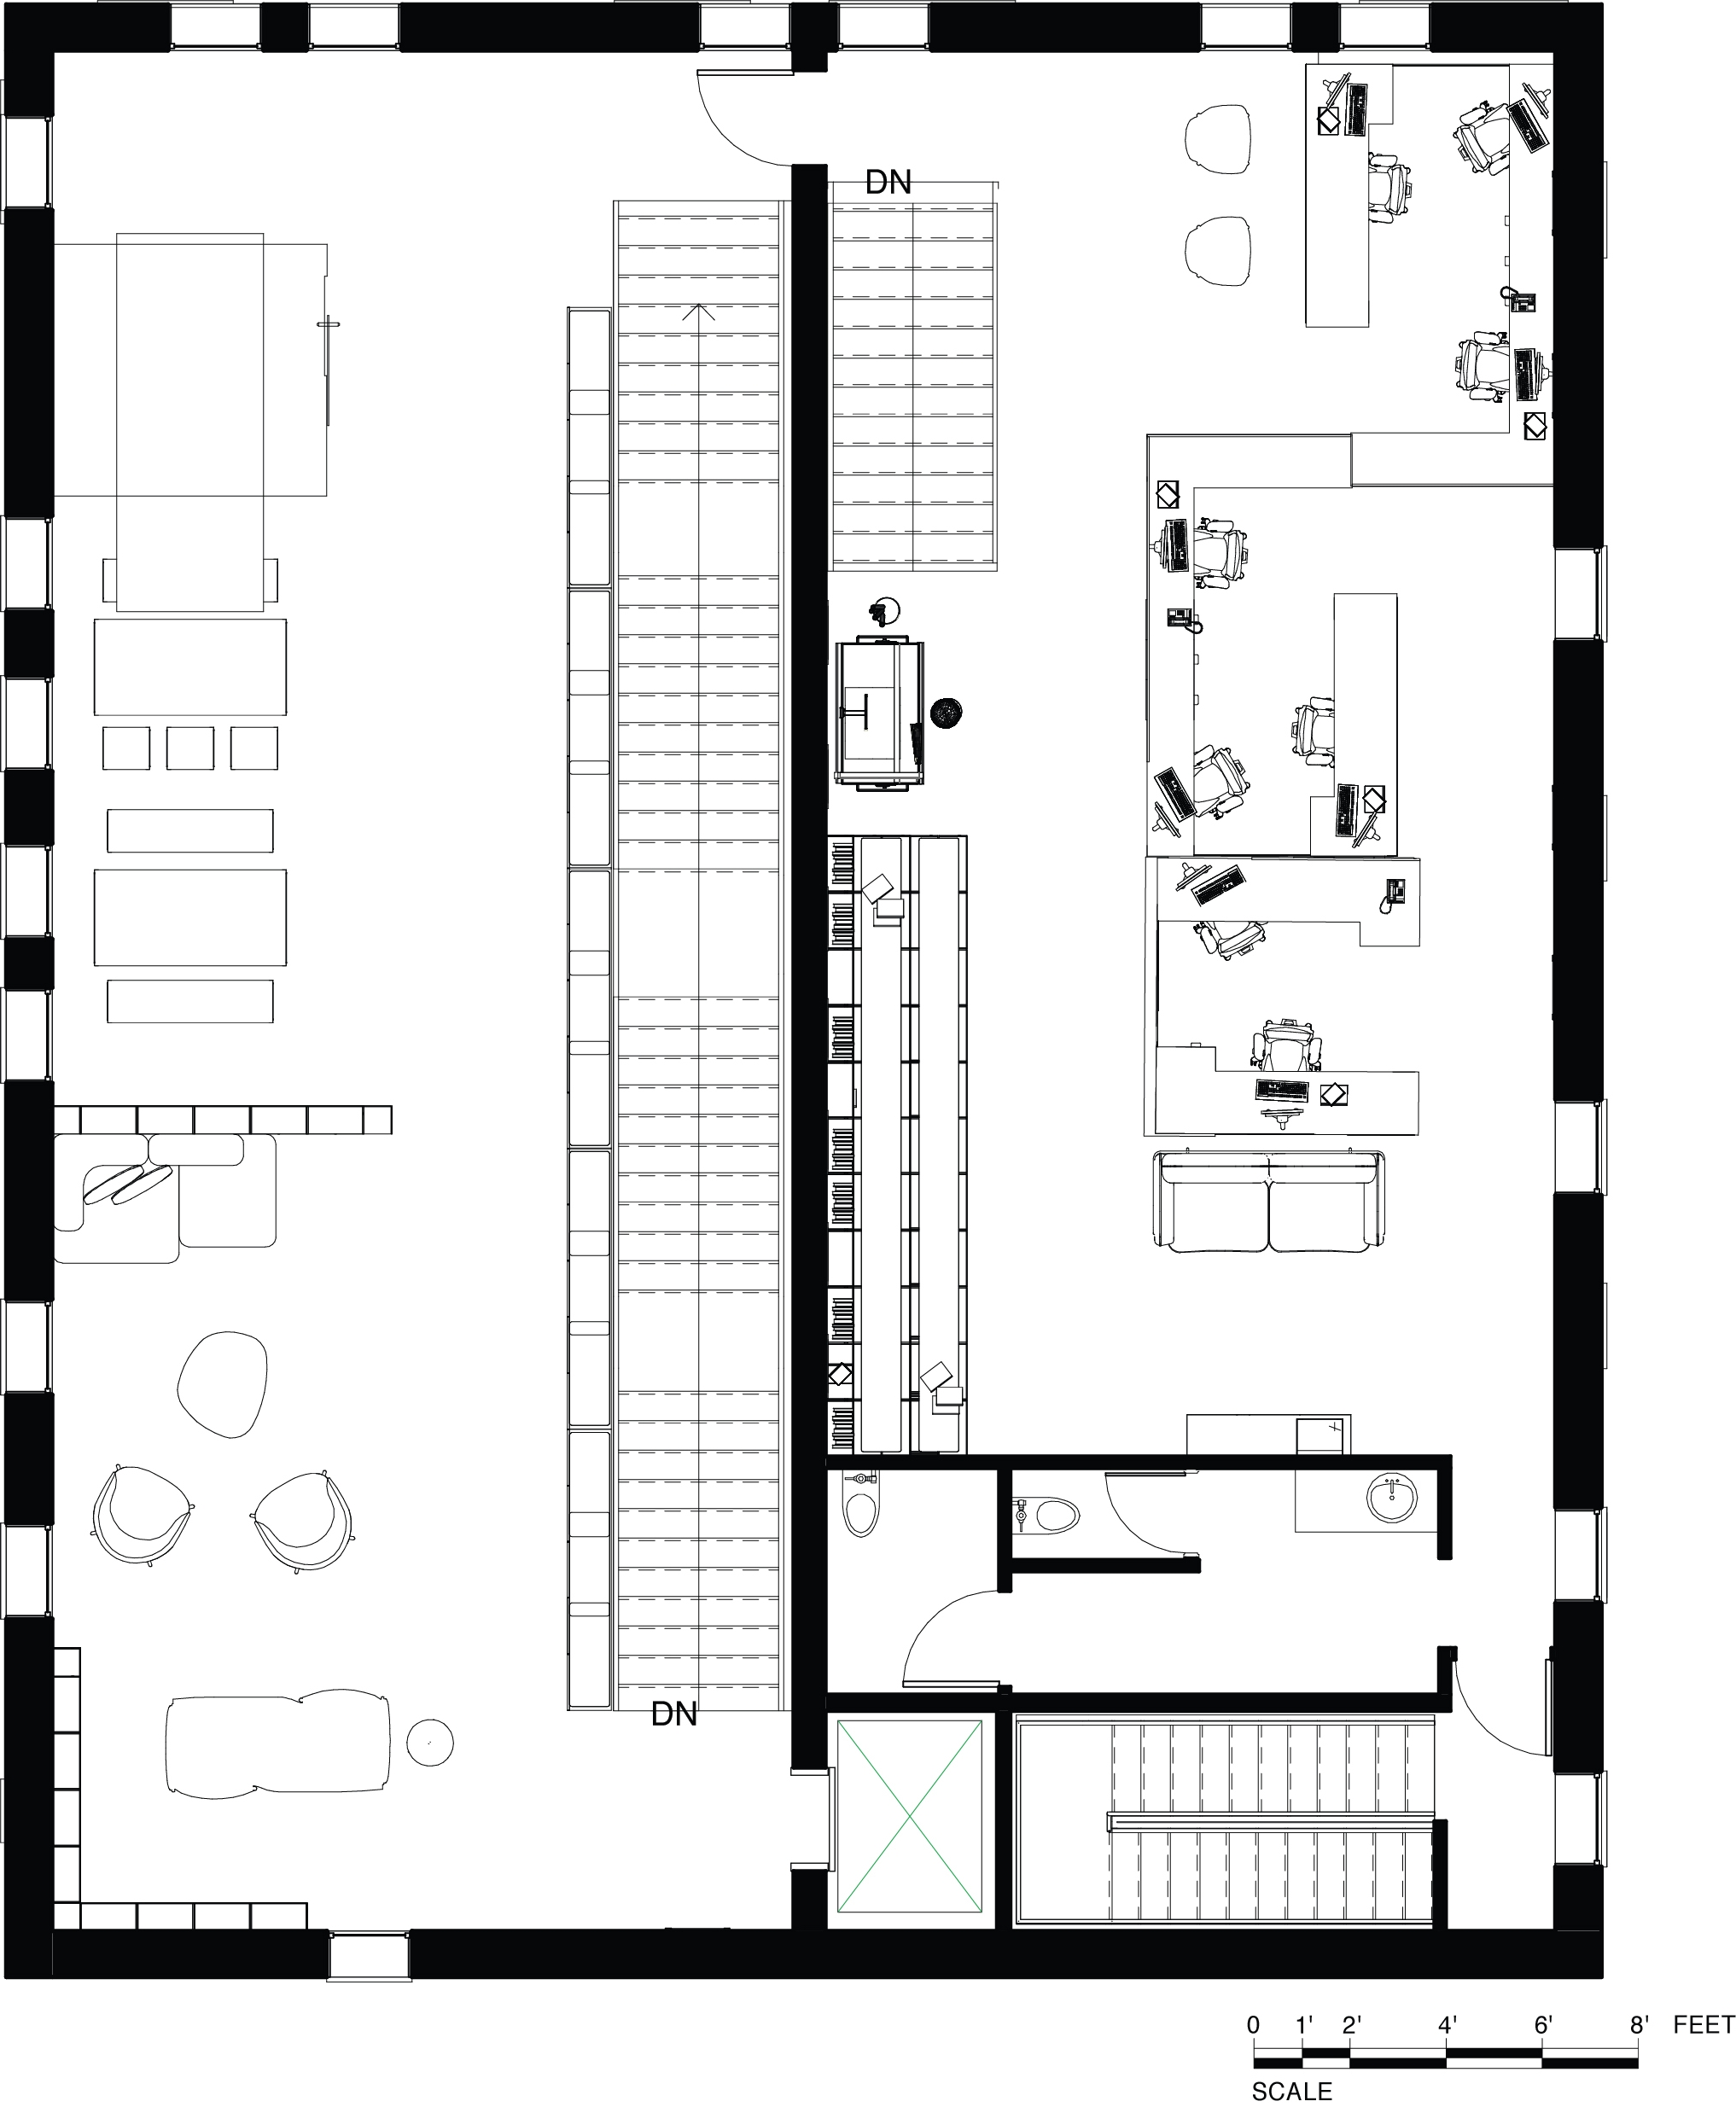 Level 03  Floor Plan - Social Impact Design Firm